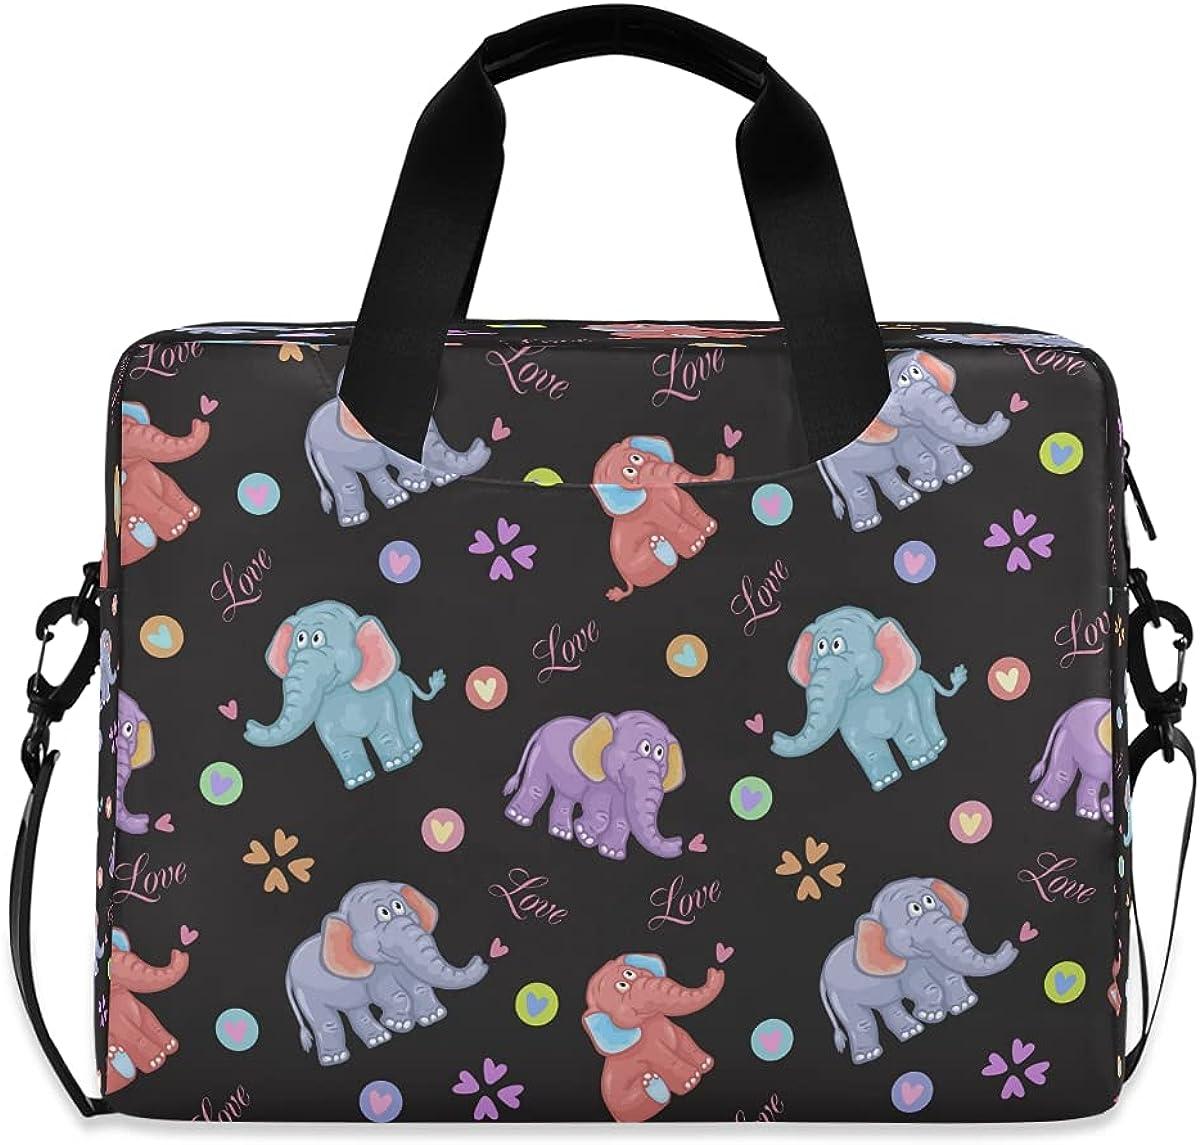 JMbuild Laptop Case 15.6 inch Compu Pattern Oklahoma Max 48% OFF City Mall Animal Elephant Cute